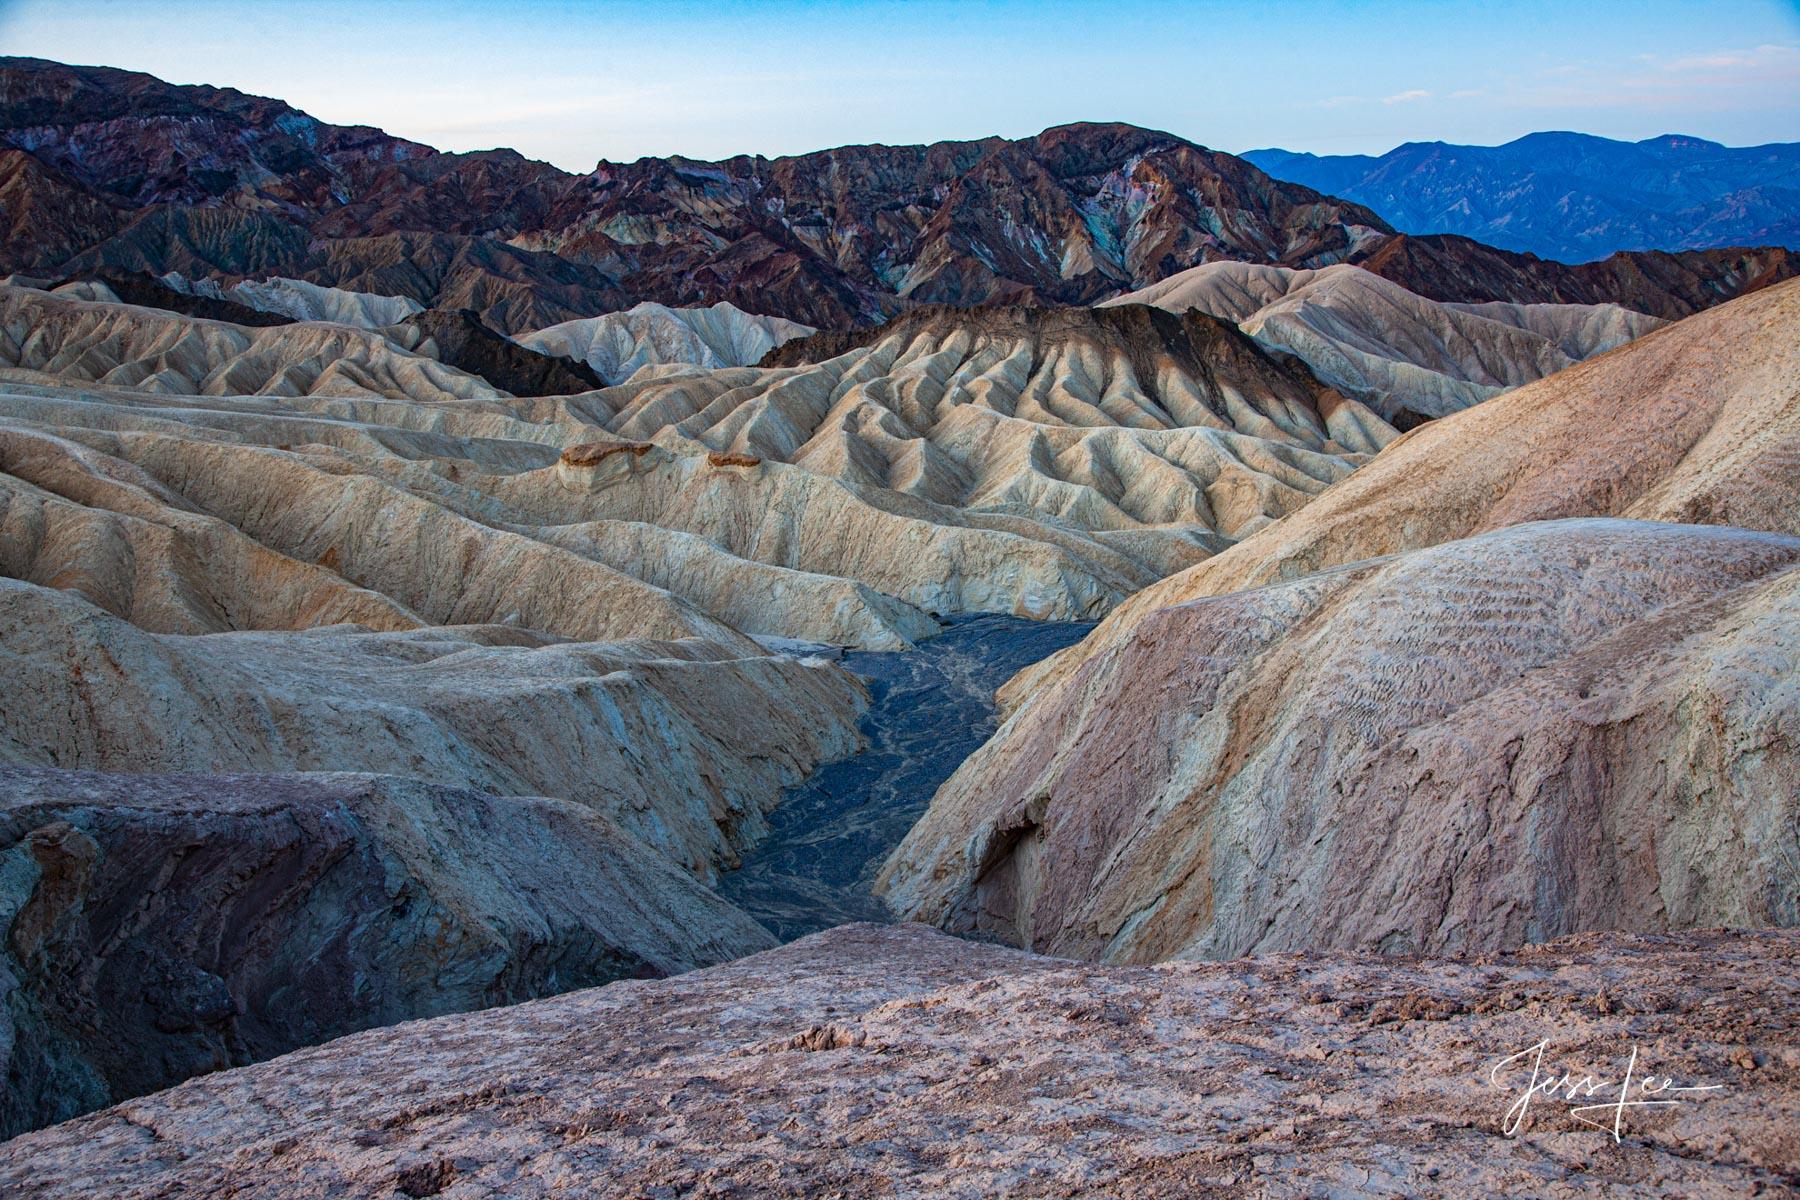 Death Valley Badlands Desert California's Death Valley Desert. 50 Exclusive high-resolution Museum Quality Fine Art Prints. Photos...